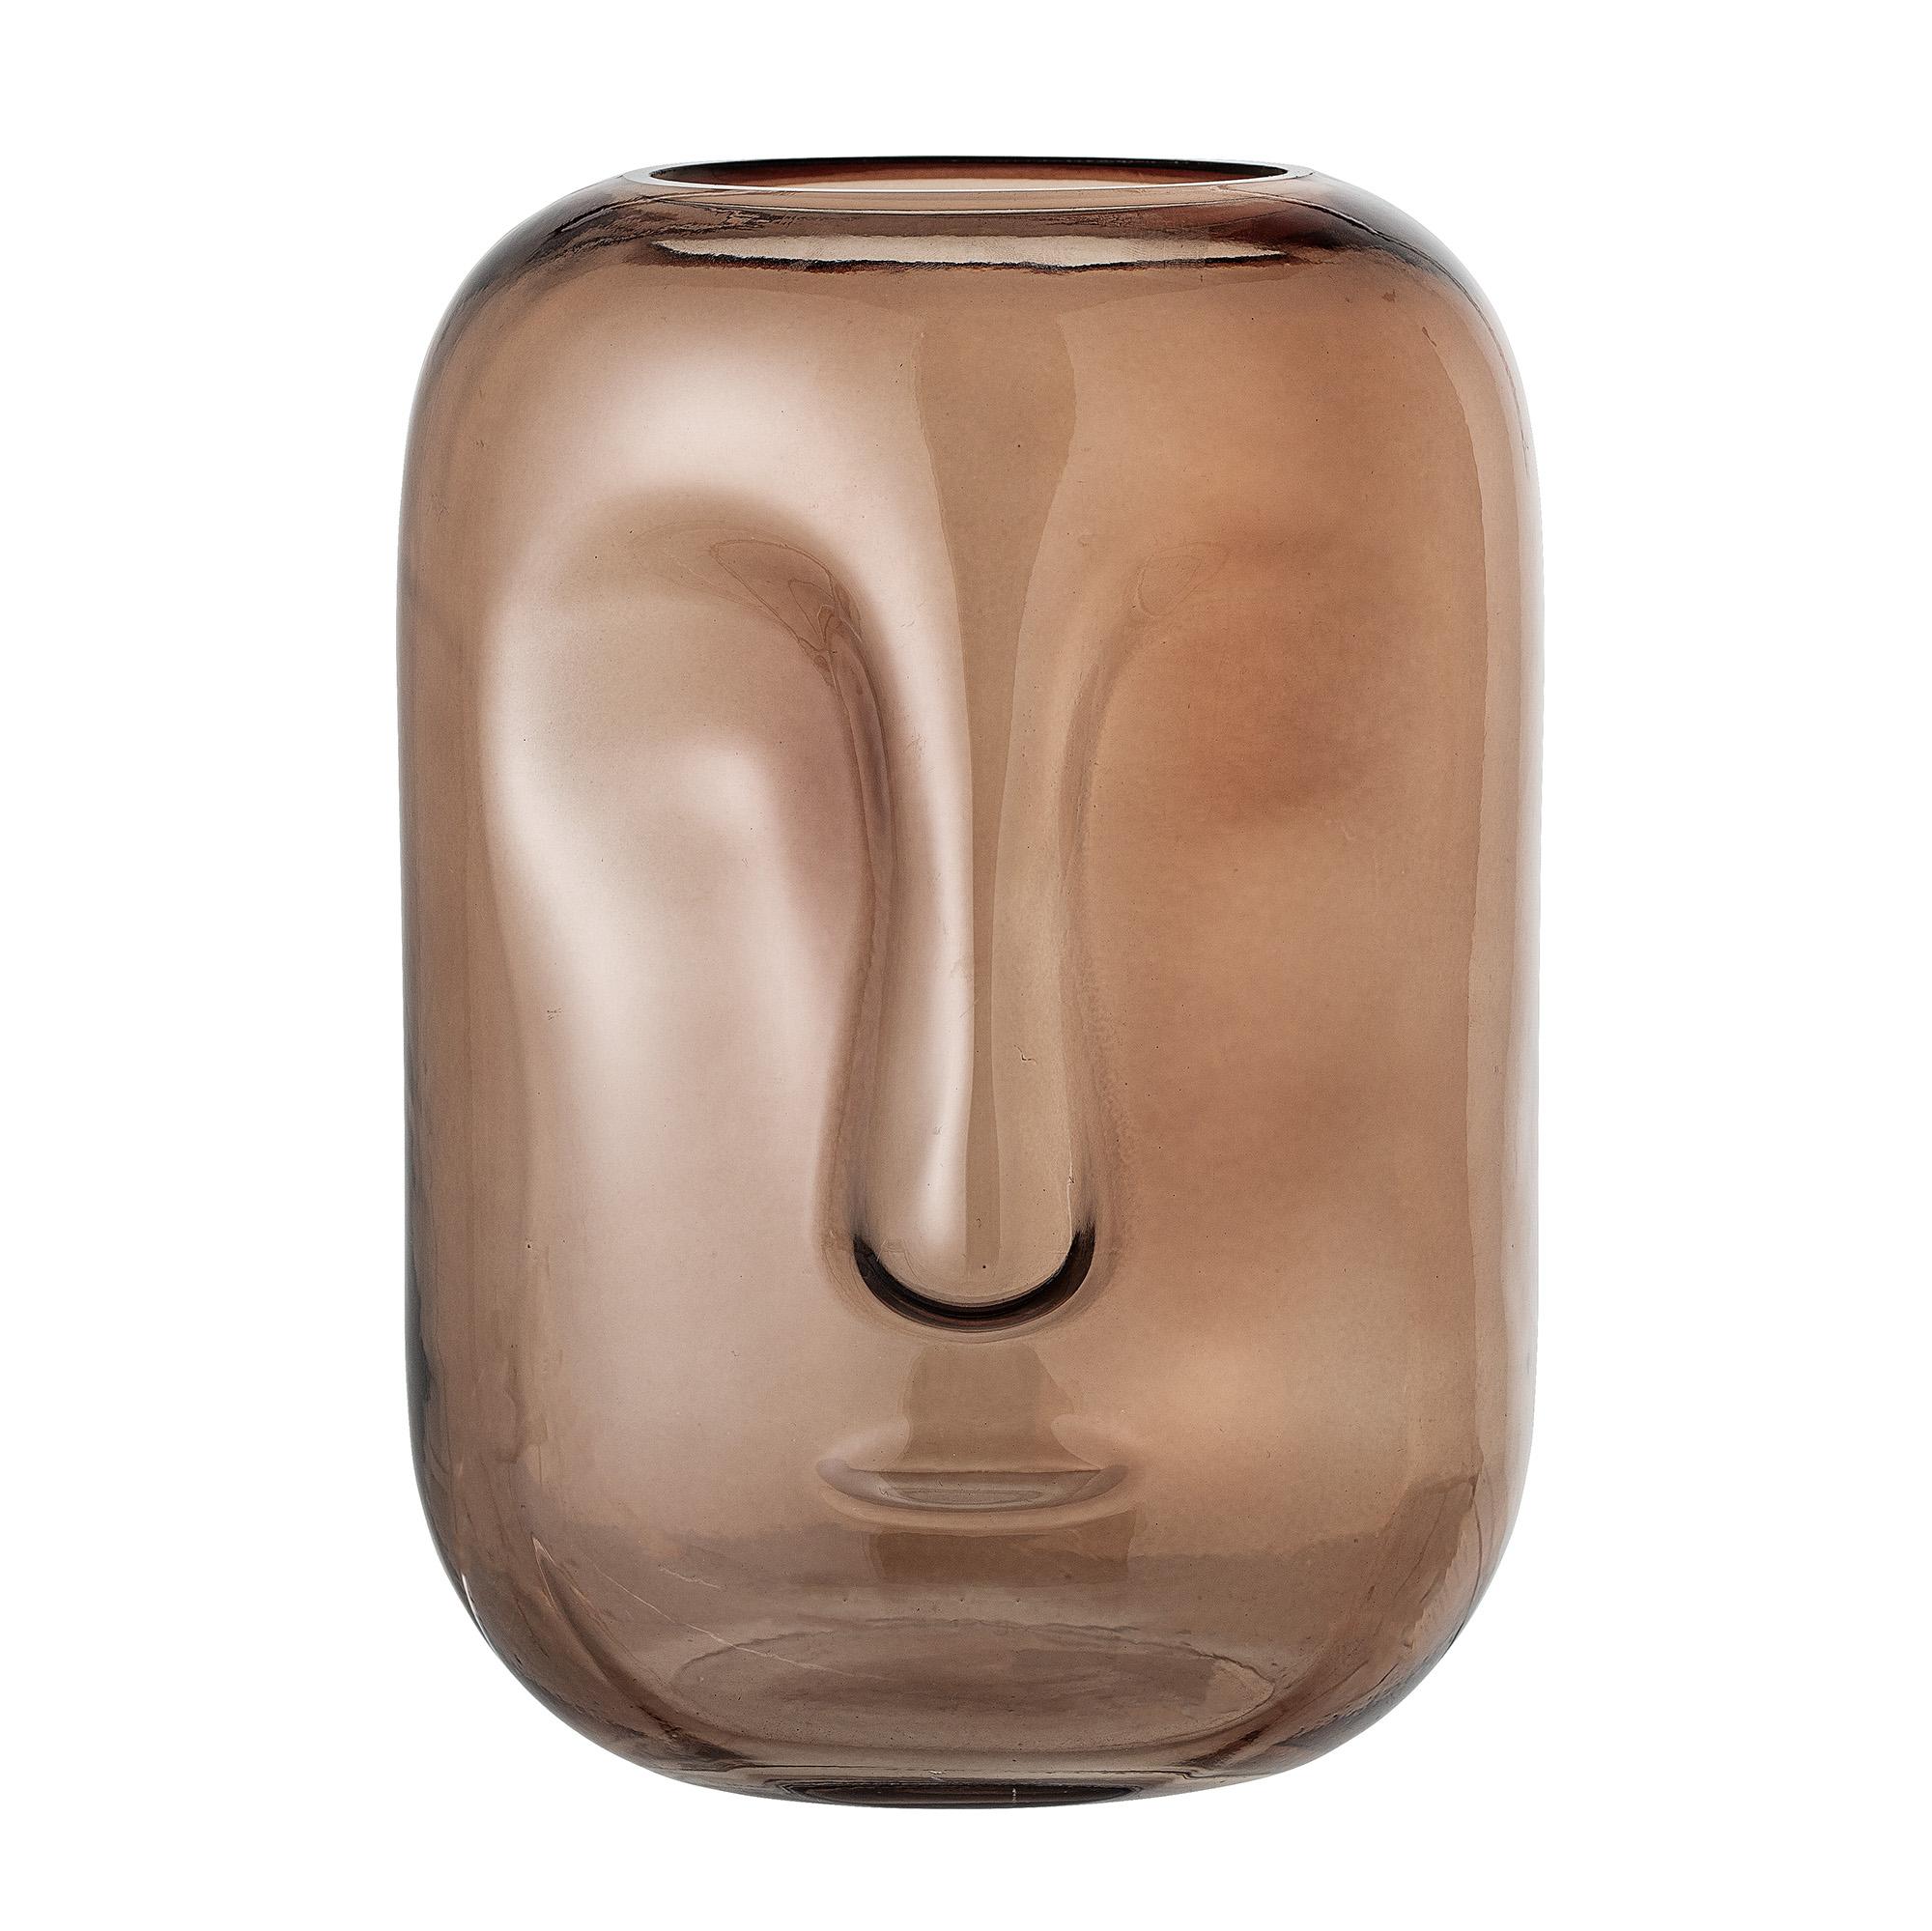 Bloomingville - Face Glass Vase Ø 18 cm - Brown (82047485)